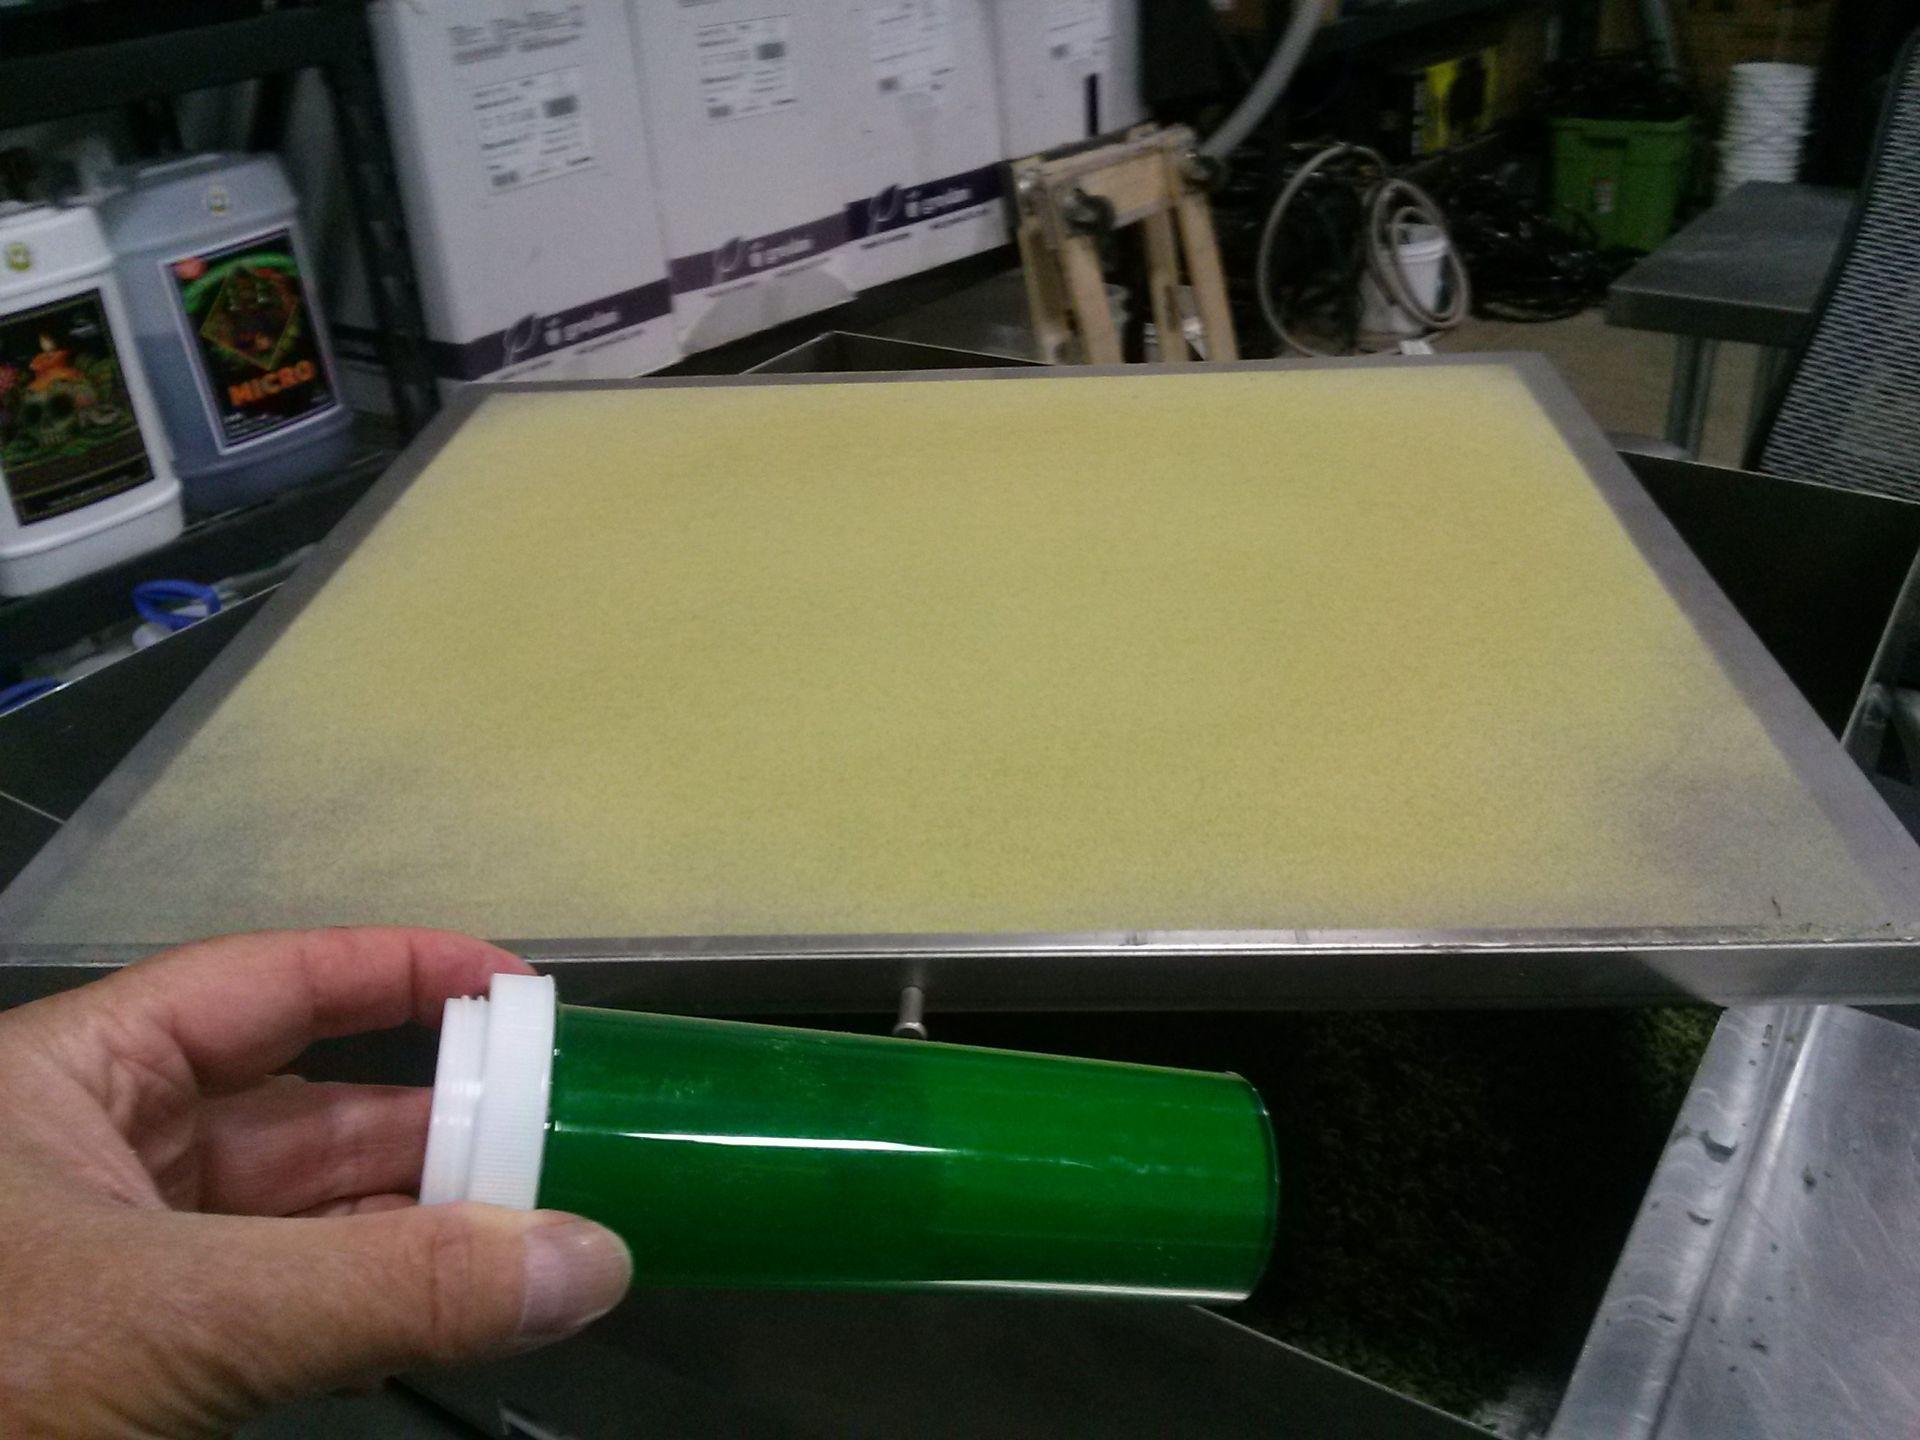 Unused/FactoryNew Revolution Cannabis & Hemp Flower Finisher System Model RDF 4300.100-200 lbs/8 hrs - Image 26 of 32